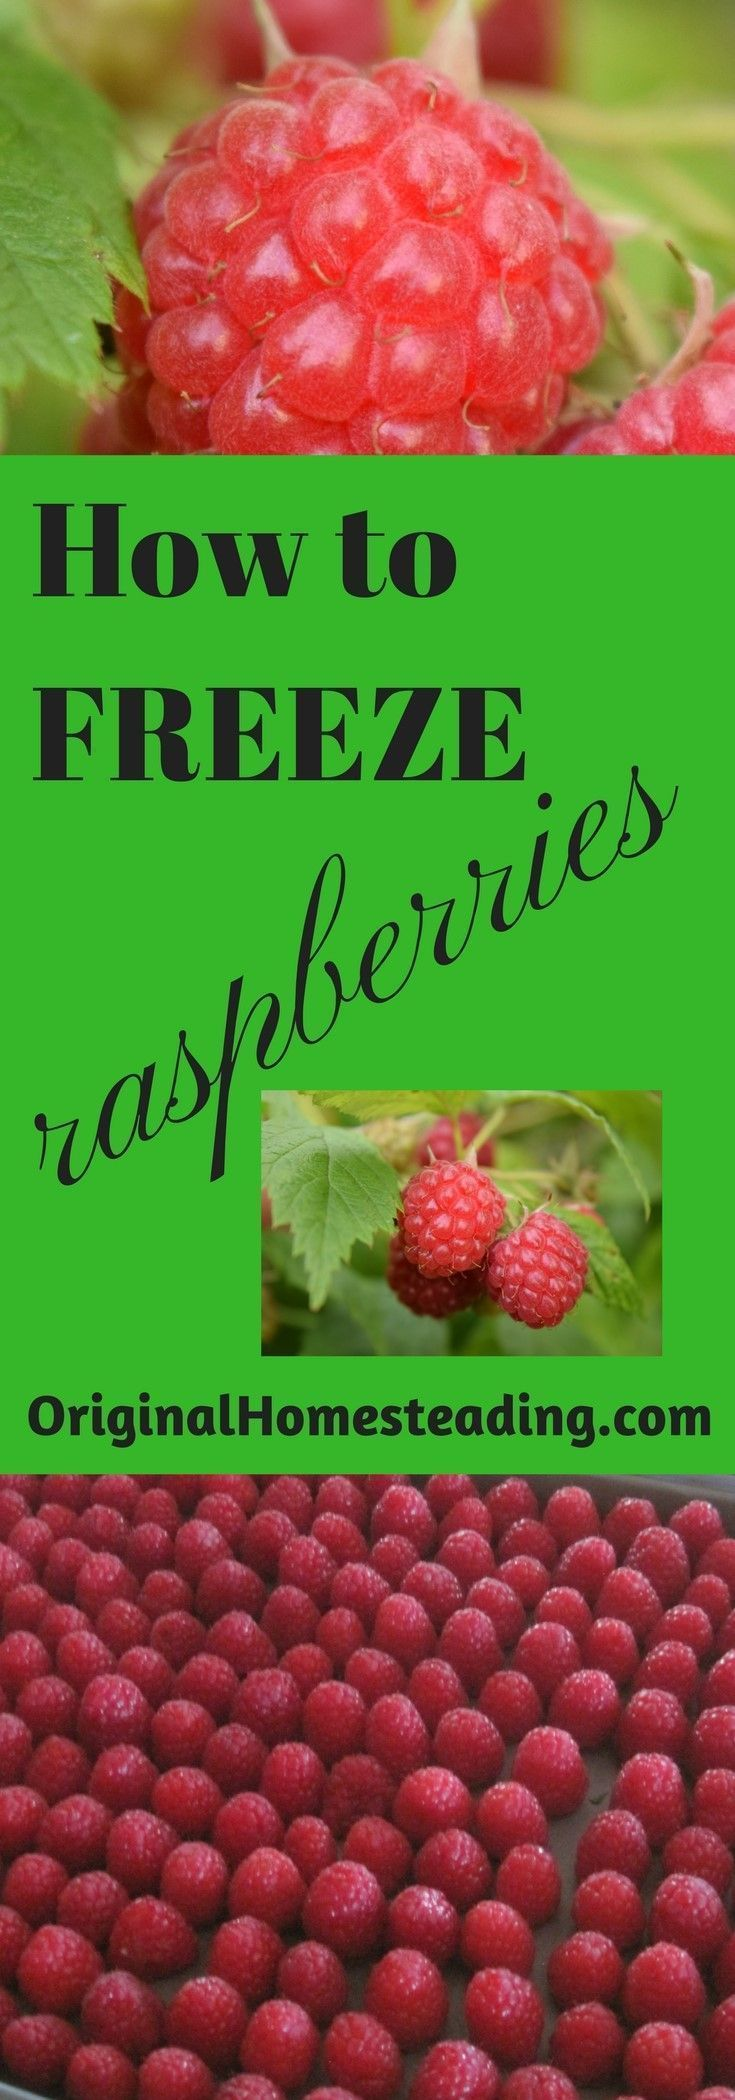 Freezing raspberries freezing fruit frozen frozen food